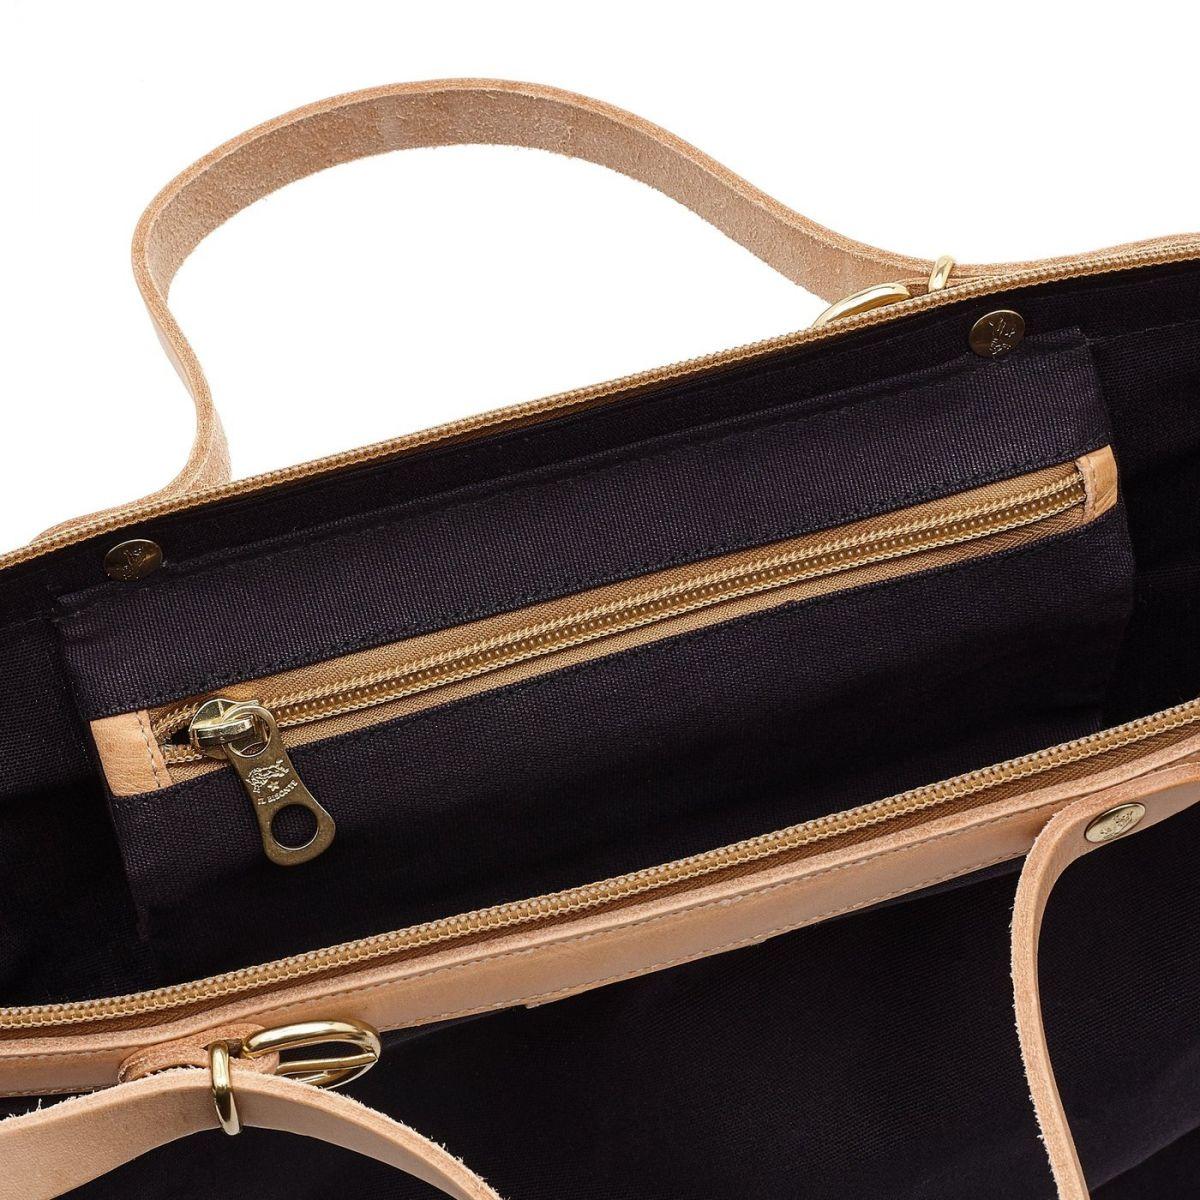 Caramella  - Women's Shoulder Bag  in Cotton Canvas BSH119 color Blue | Details